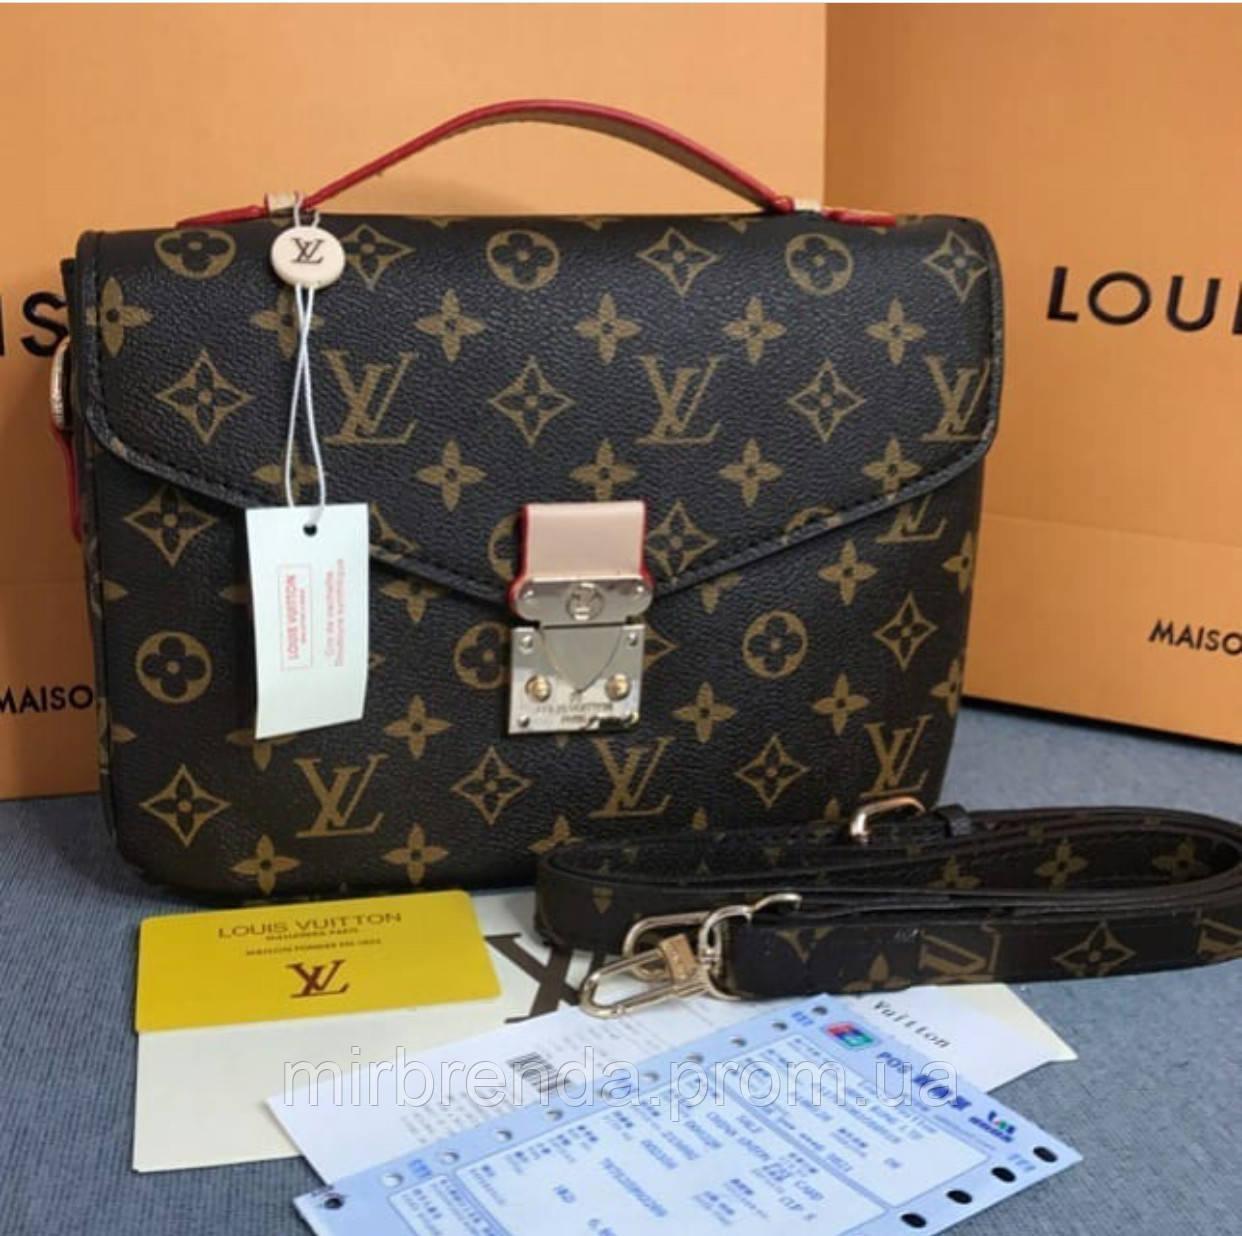 451400ae5214 Сумка Louis Vuitton Metis - Луи Витон Метис в Наличии — в Категории ...